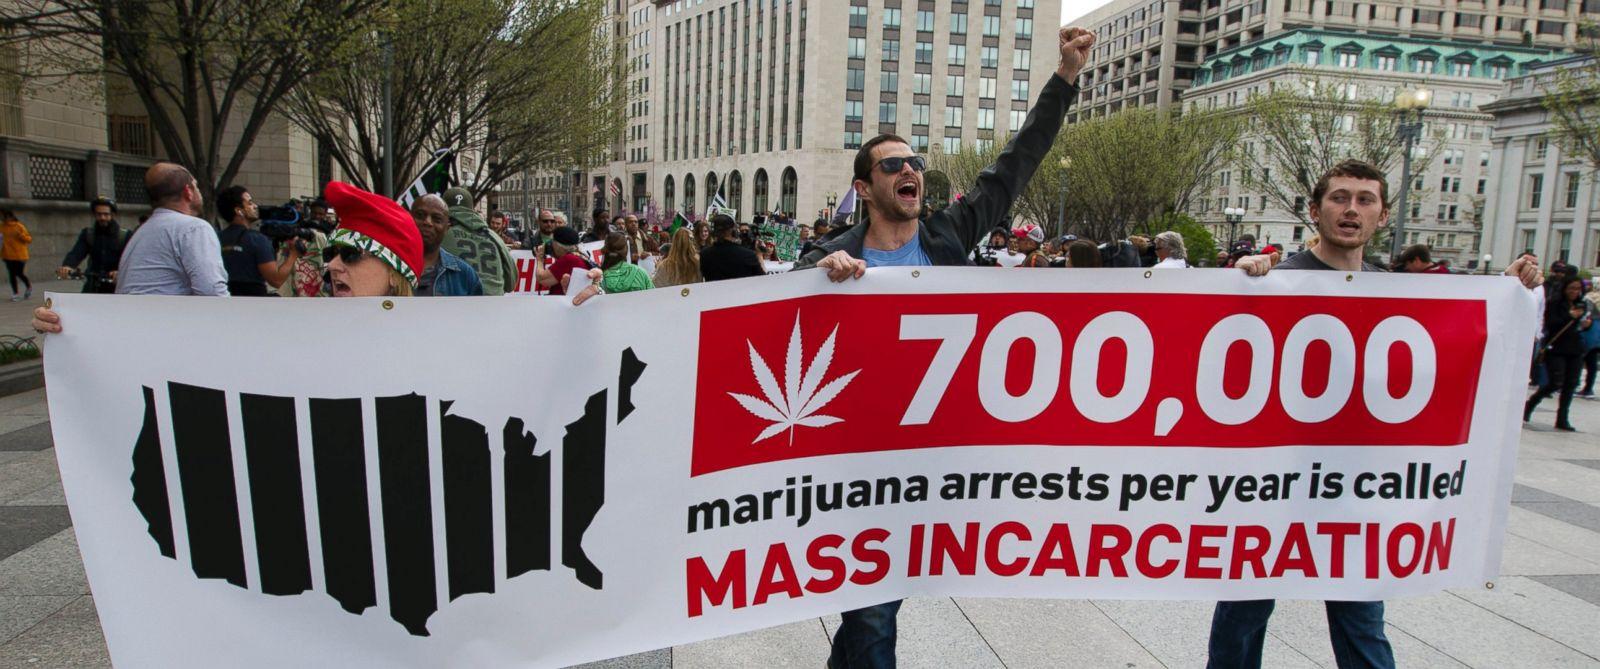 AP_marijuana_protest_2_jt_160402_31x13_1600.jpg